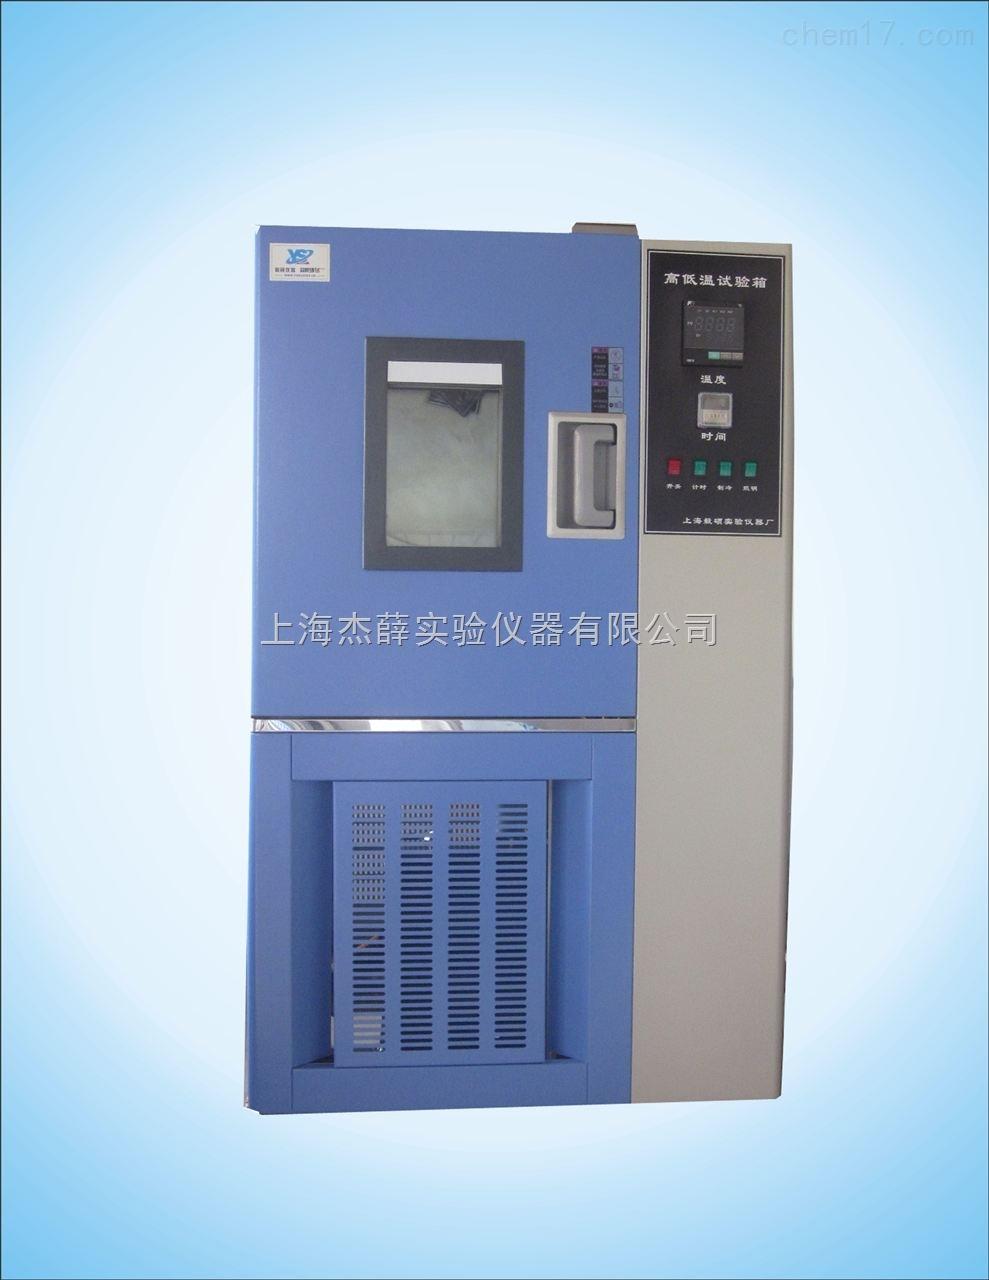 GDW-800L可程式恒温恒湿试验箱